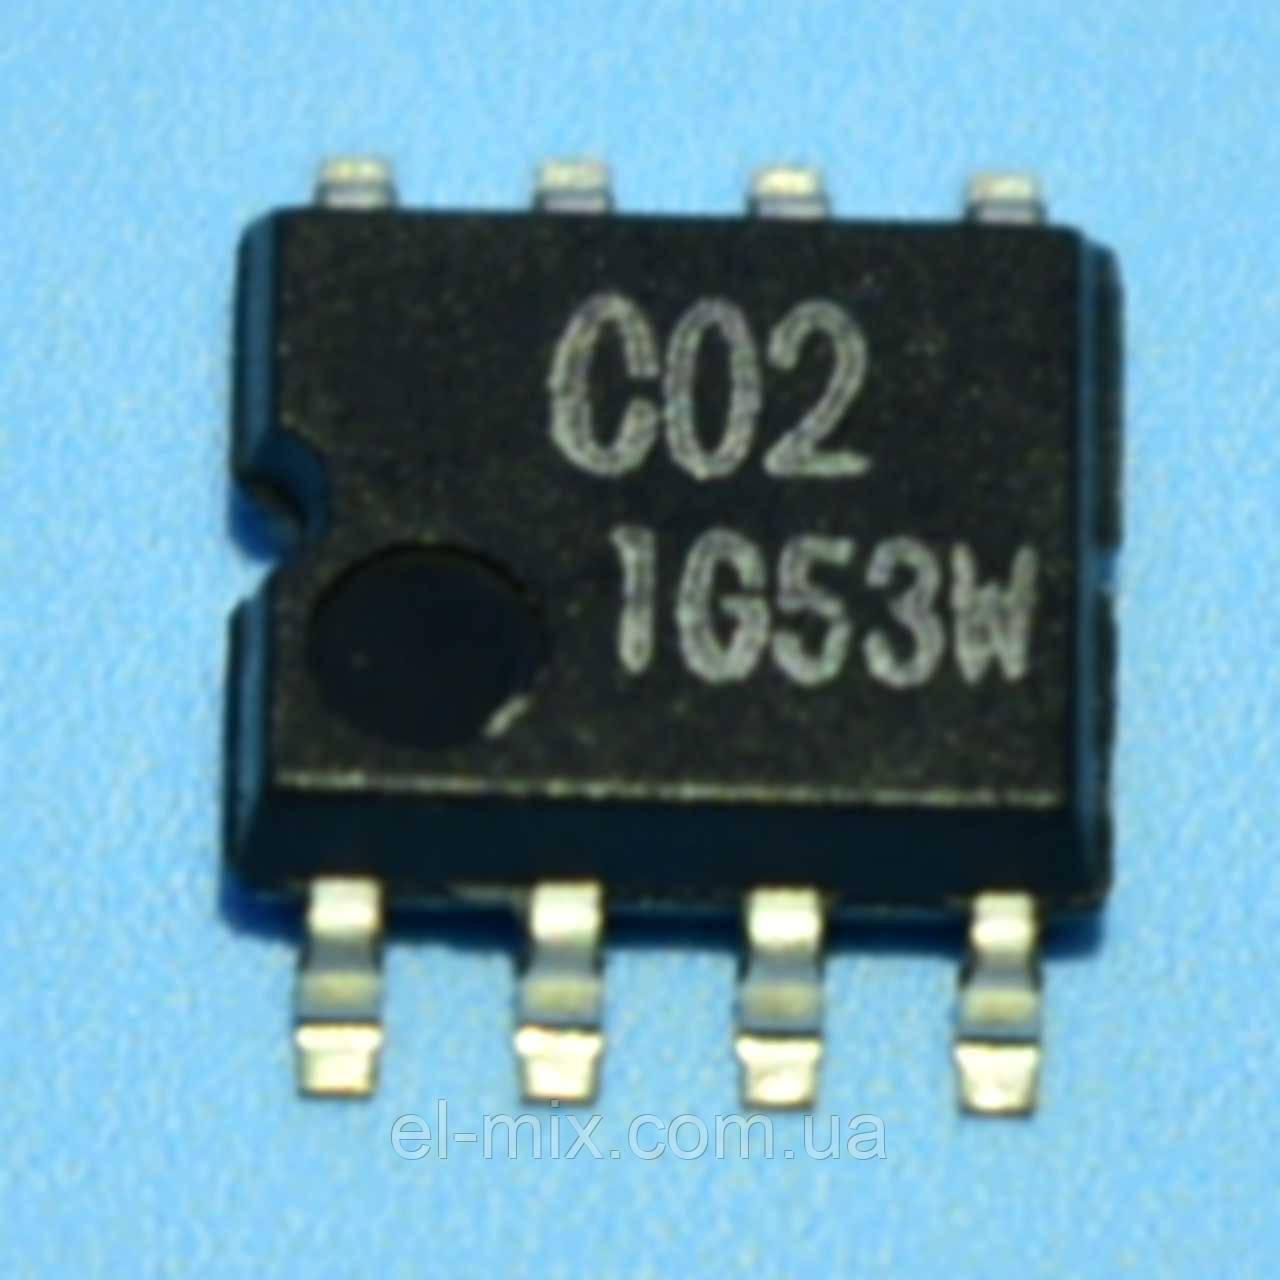 Микросхема 24с02F-W  SO-8  Rohm